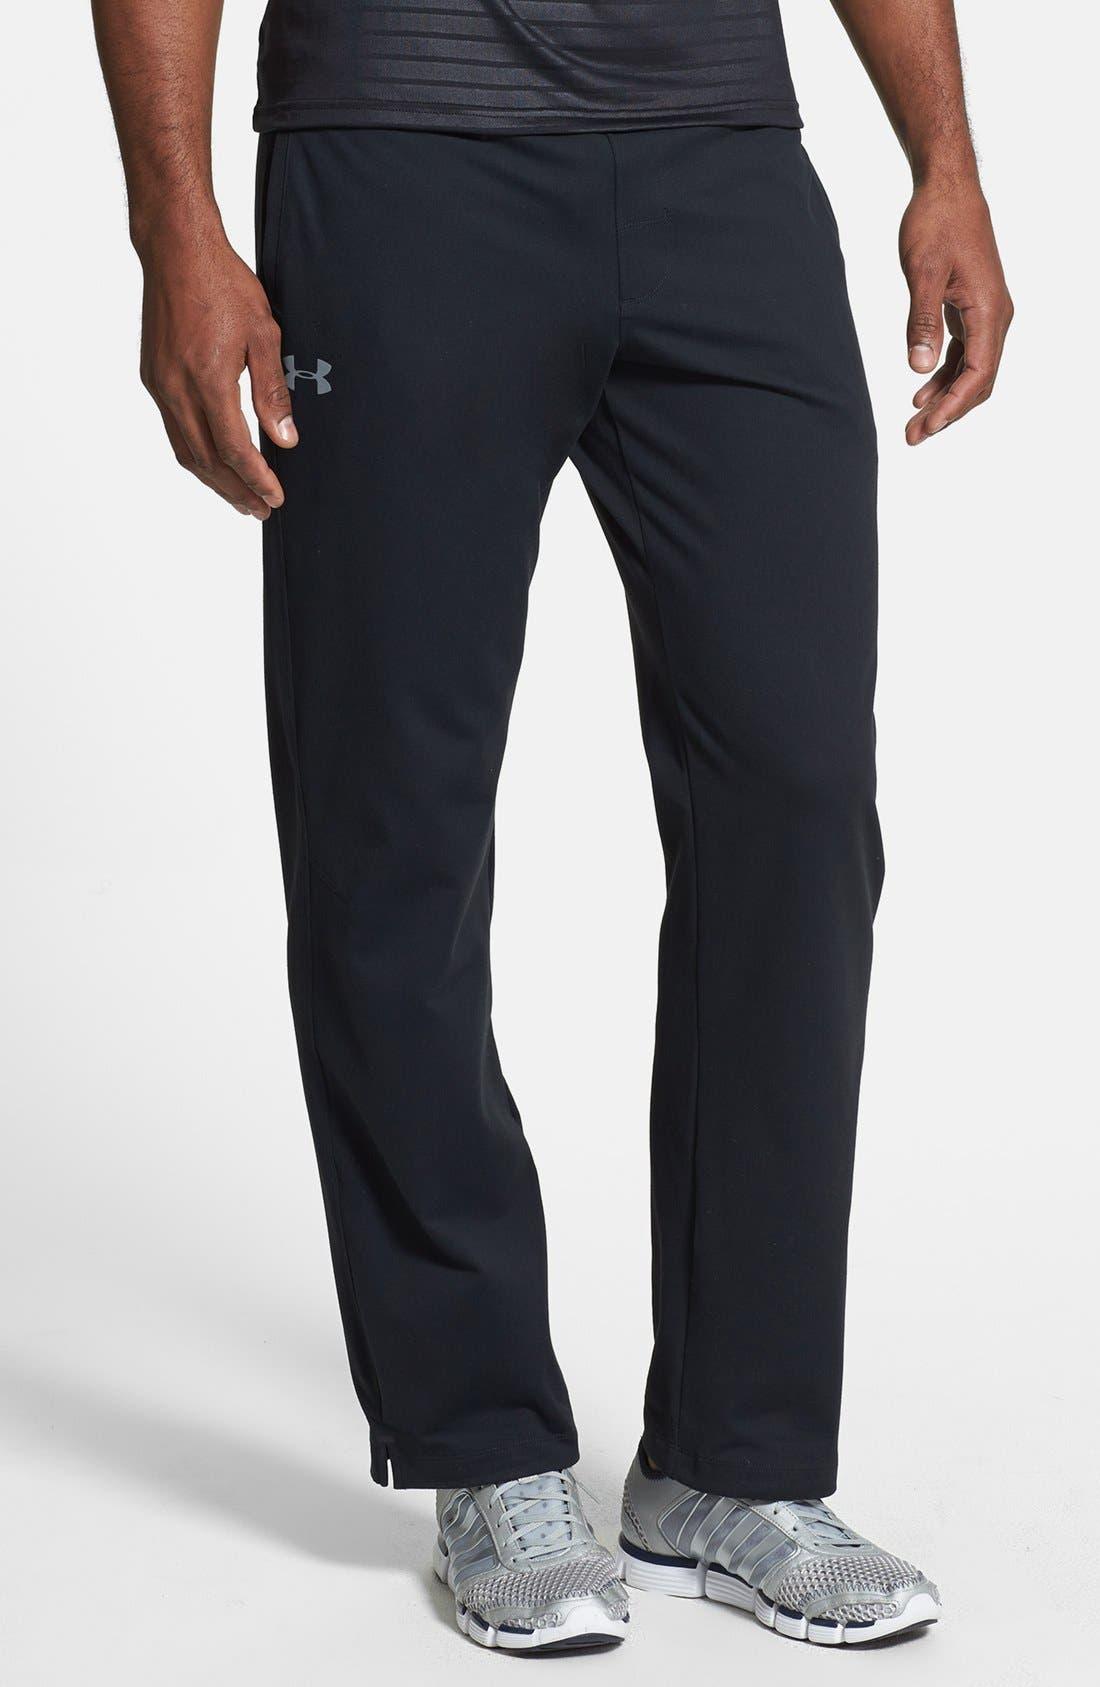 Main Image - Under Armour 'X-Alt' Fleece Pants